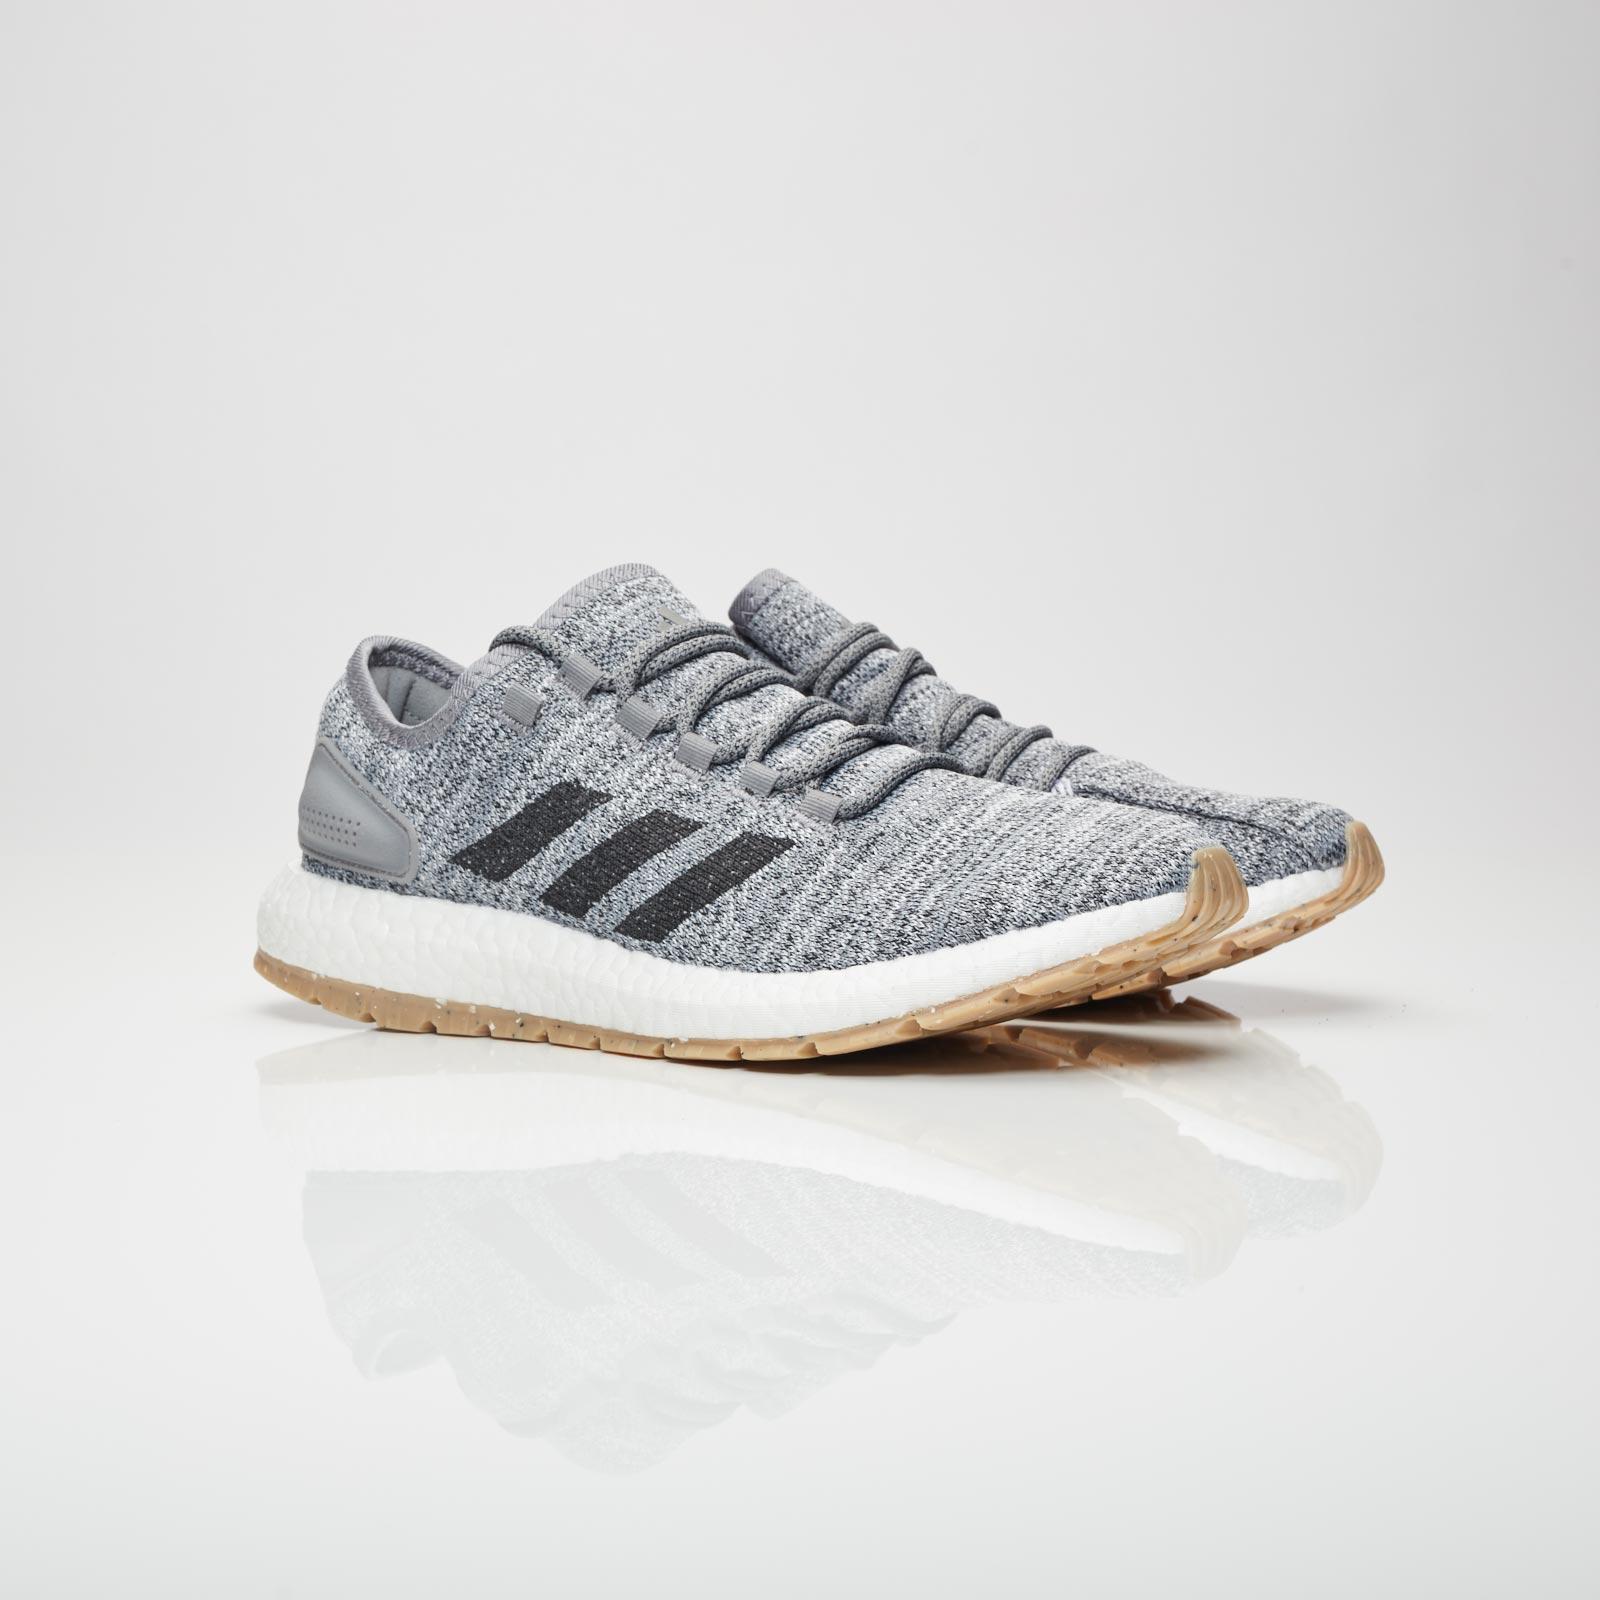 adidas reine fördern all - terrain s80783 sneakersnstuff turnschuhe